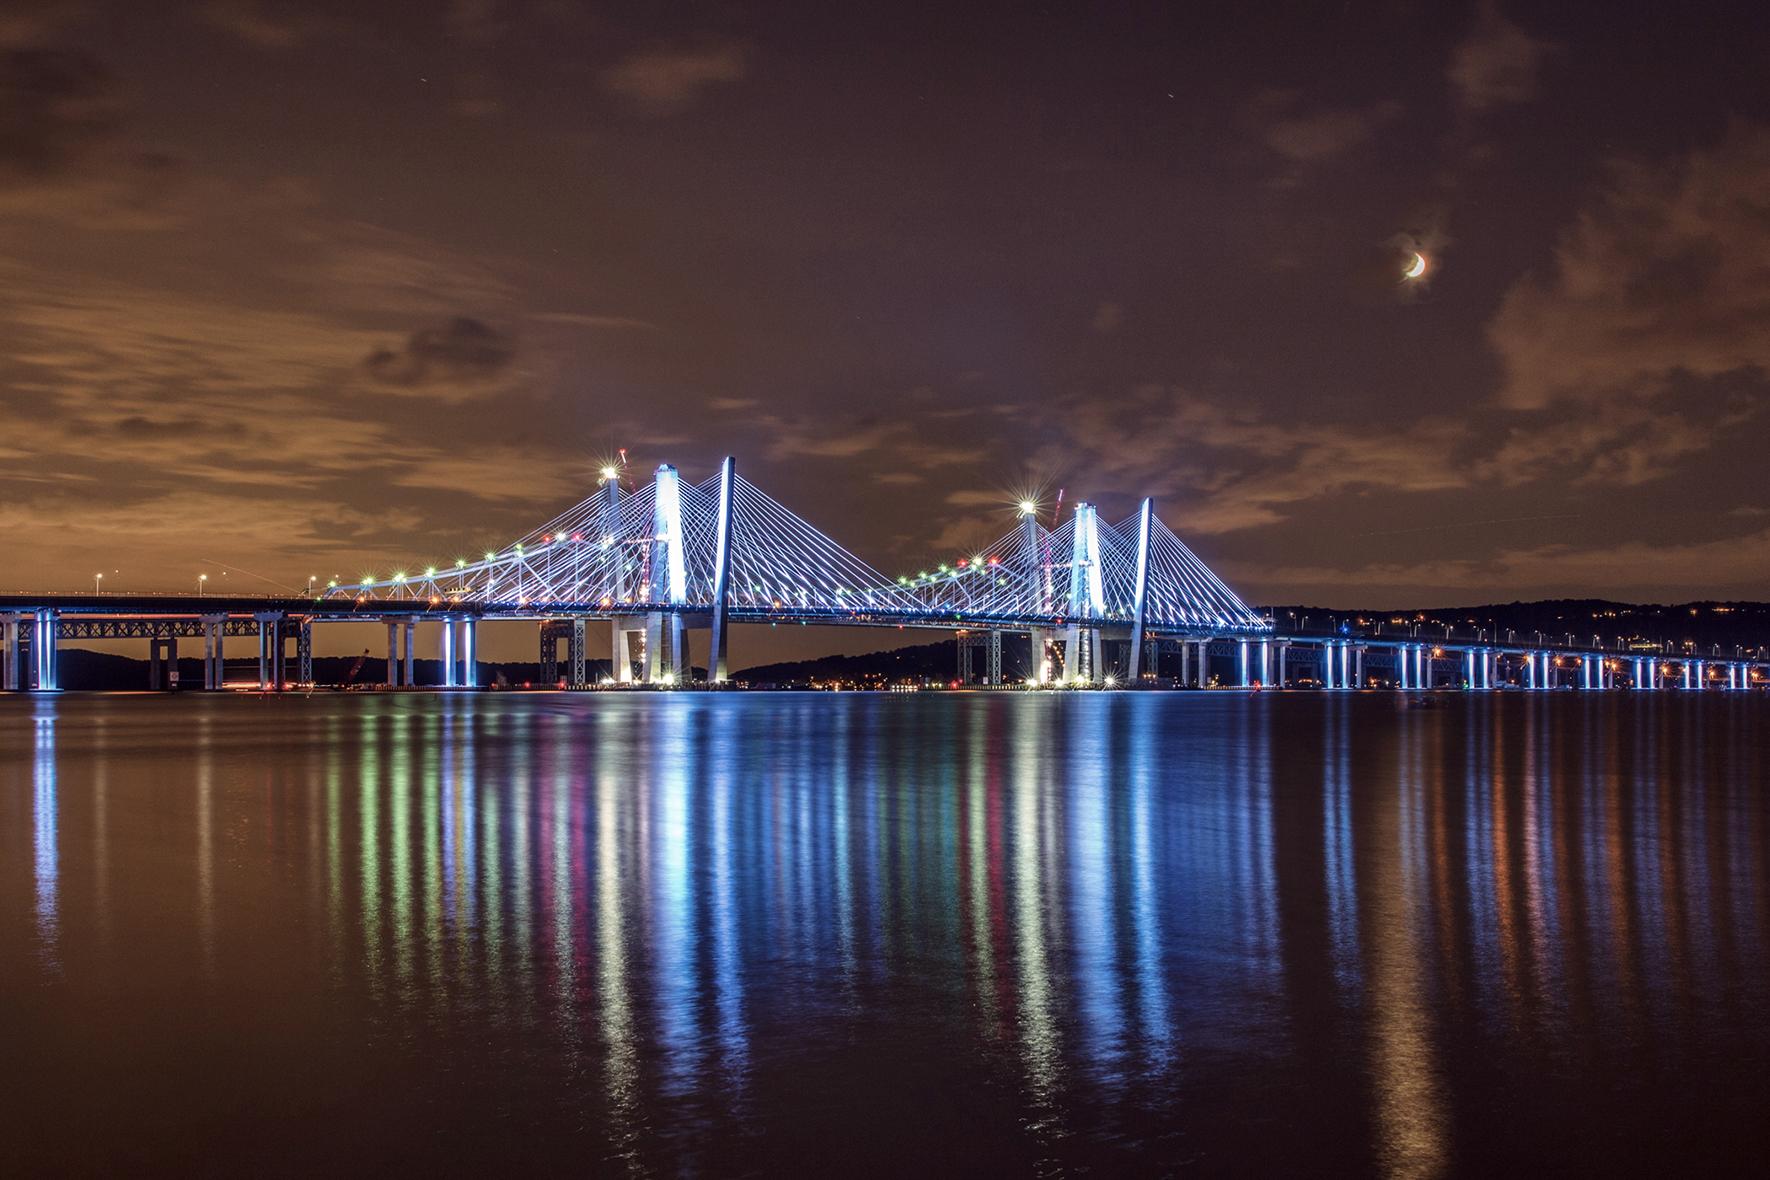 Mario M Cuomo Bridge (Tappan Zee Crossing)